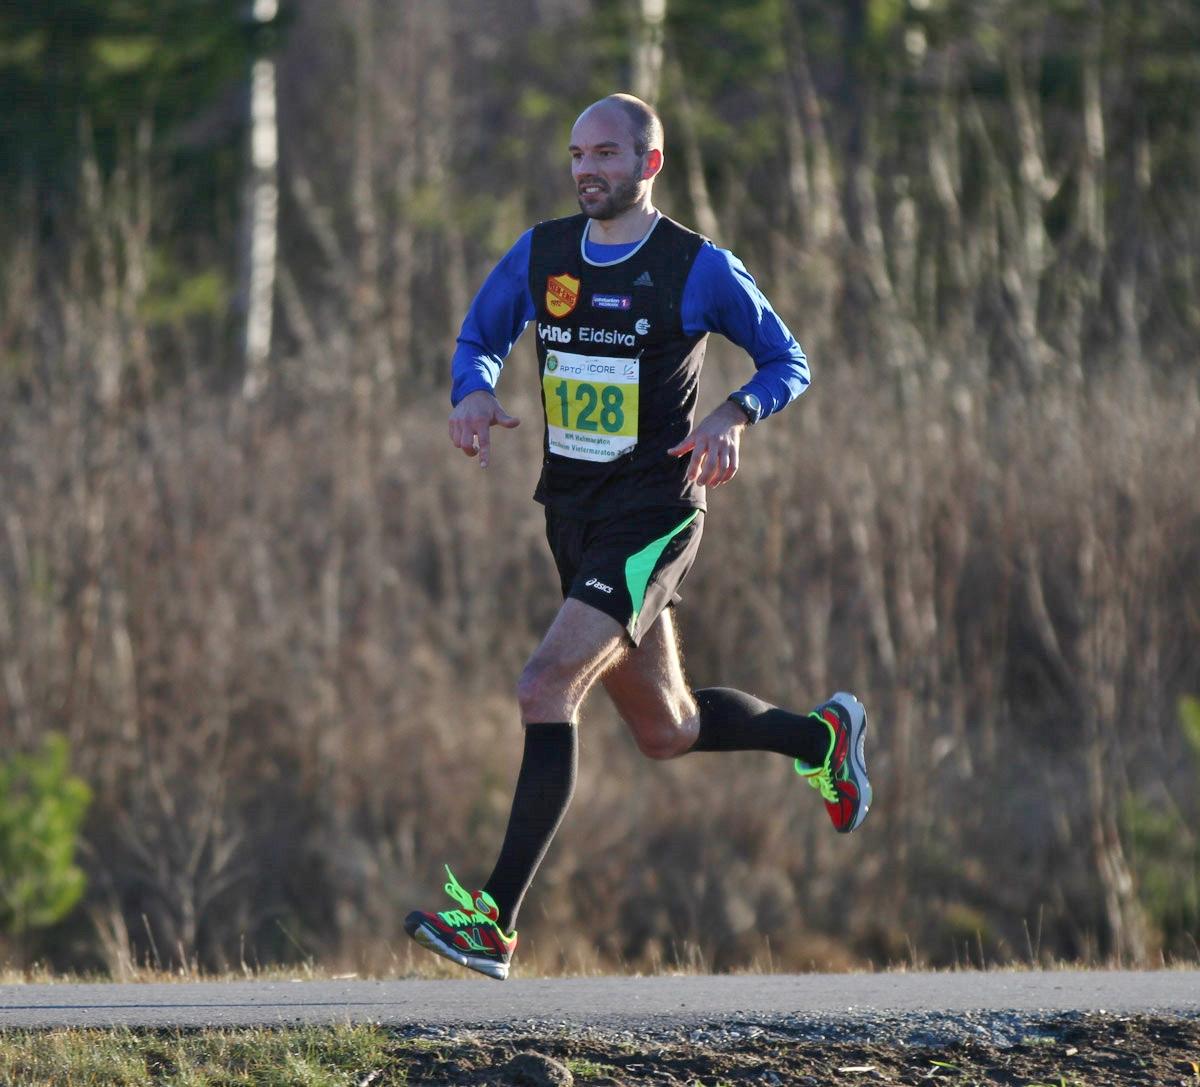 Vintermaraton2013_John-Henry-Strupstad_41-9km.jpg